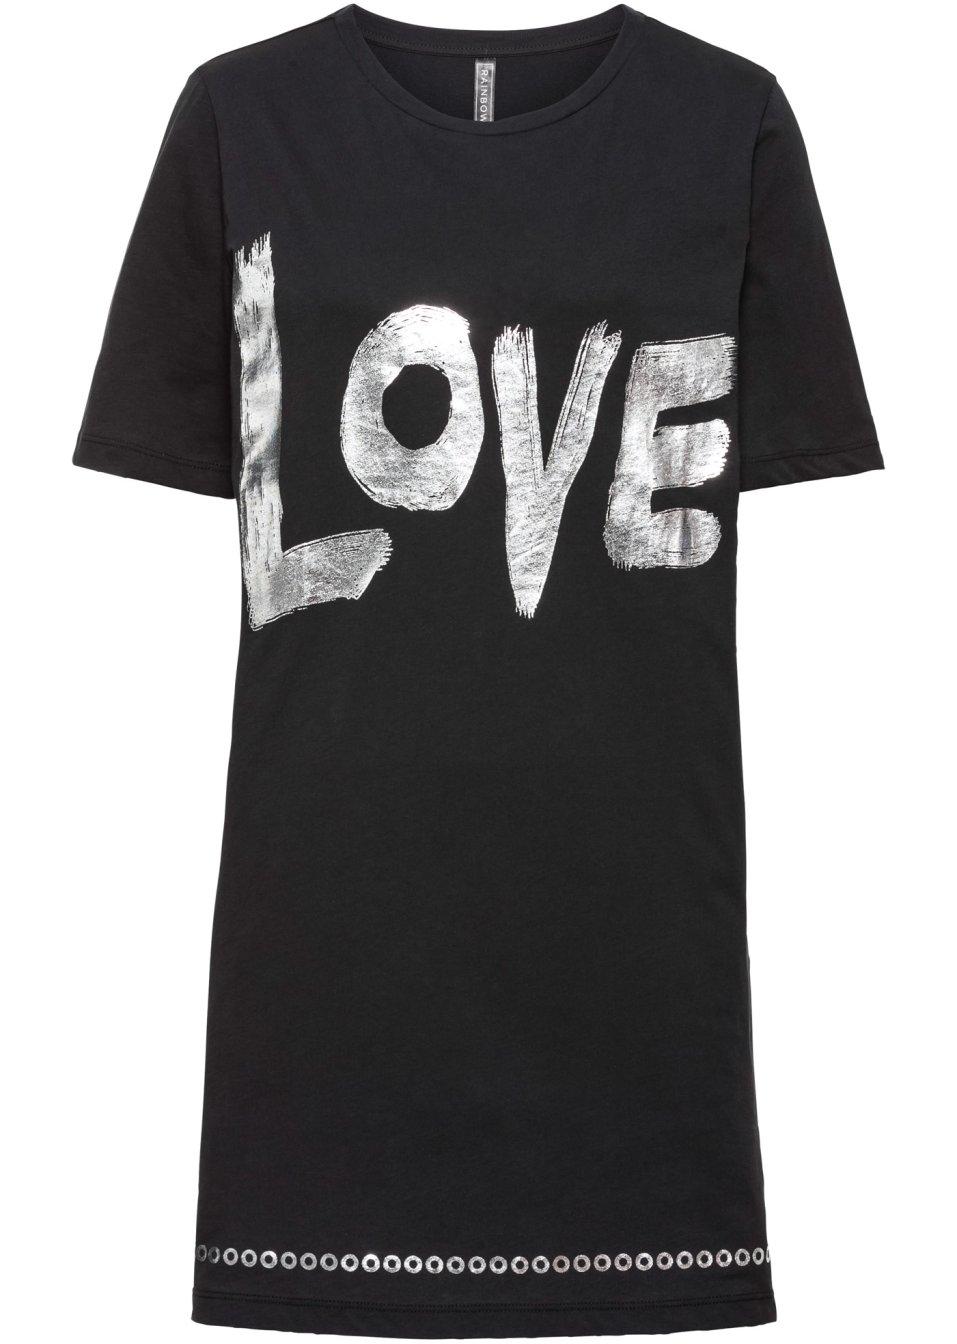 robe t shirt noir imprim rainbow. Black Bedroom Furniture Sets. Home Design Ideas